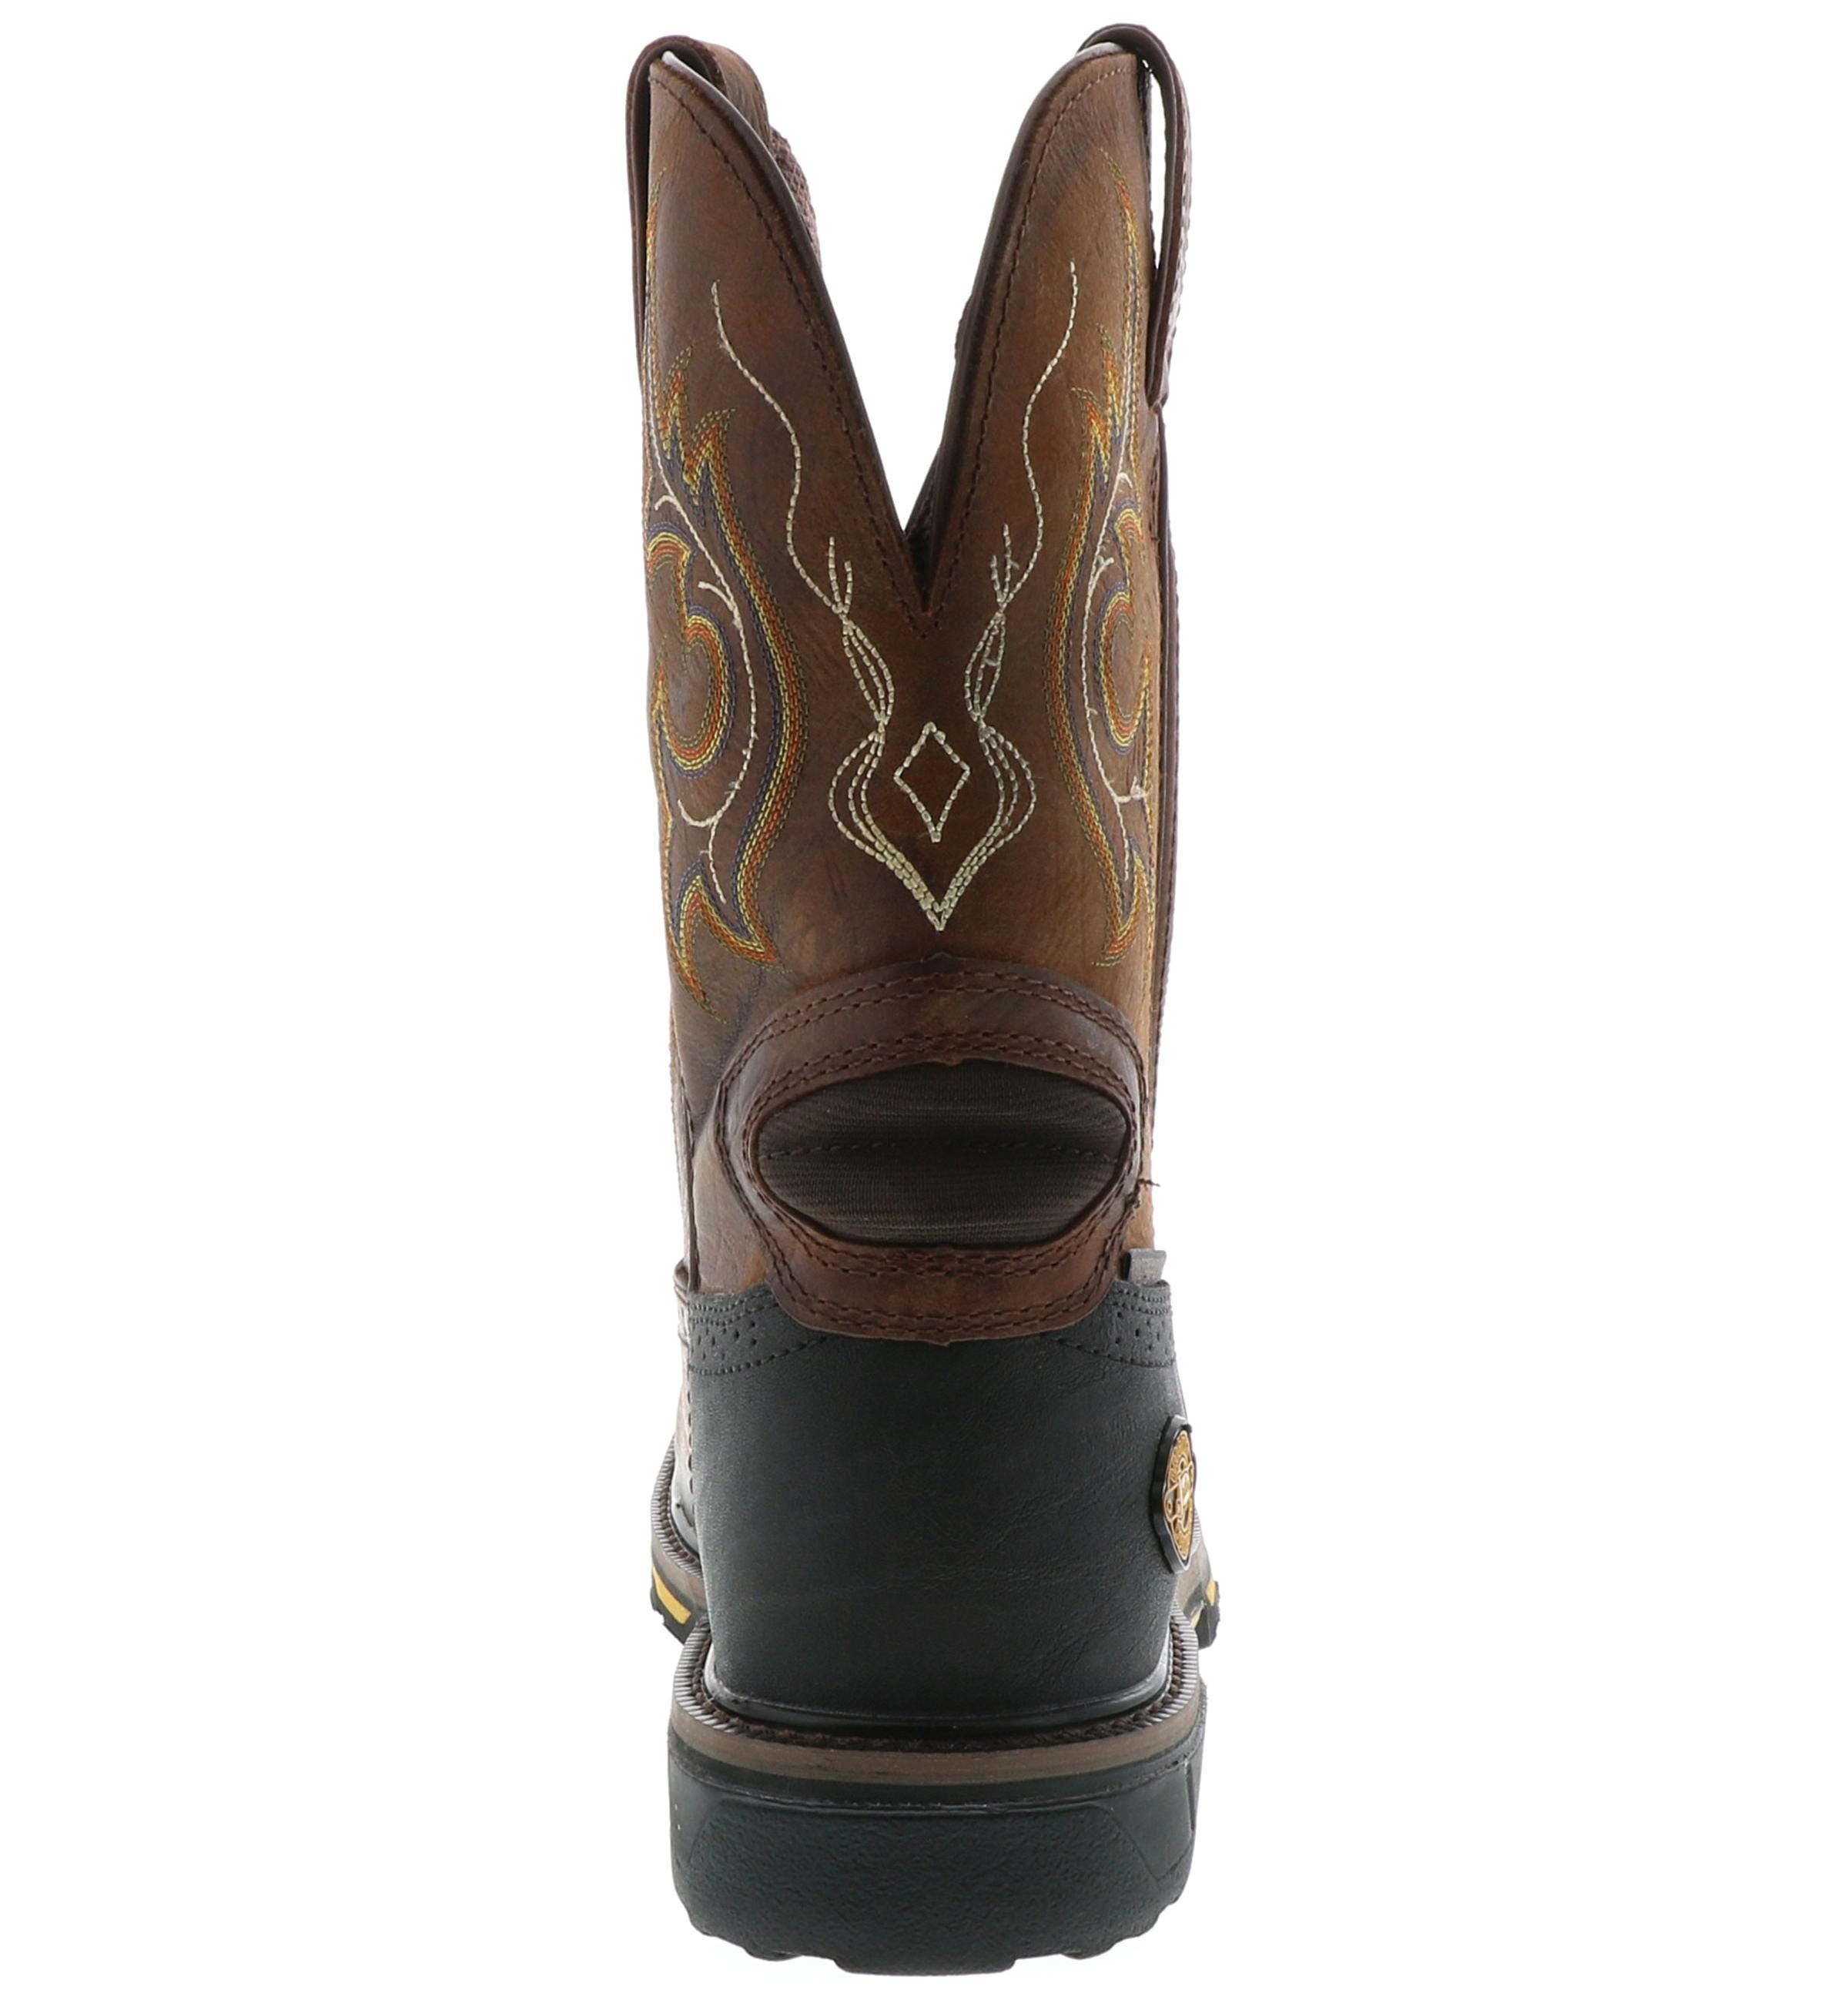 97543bda3aa Men's Justin Boots Joist Comp Toe